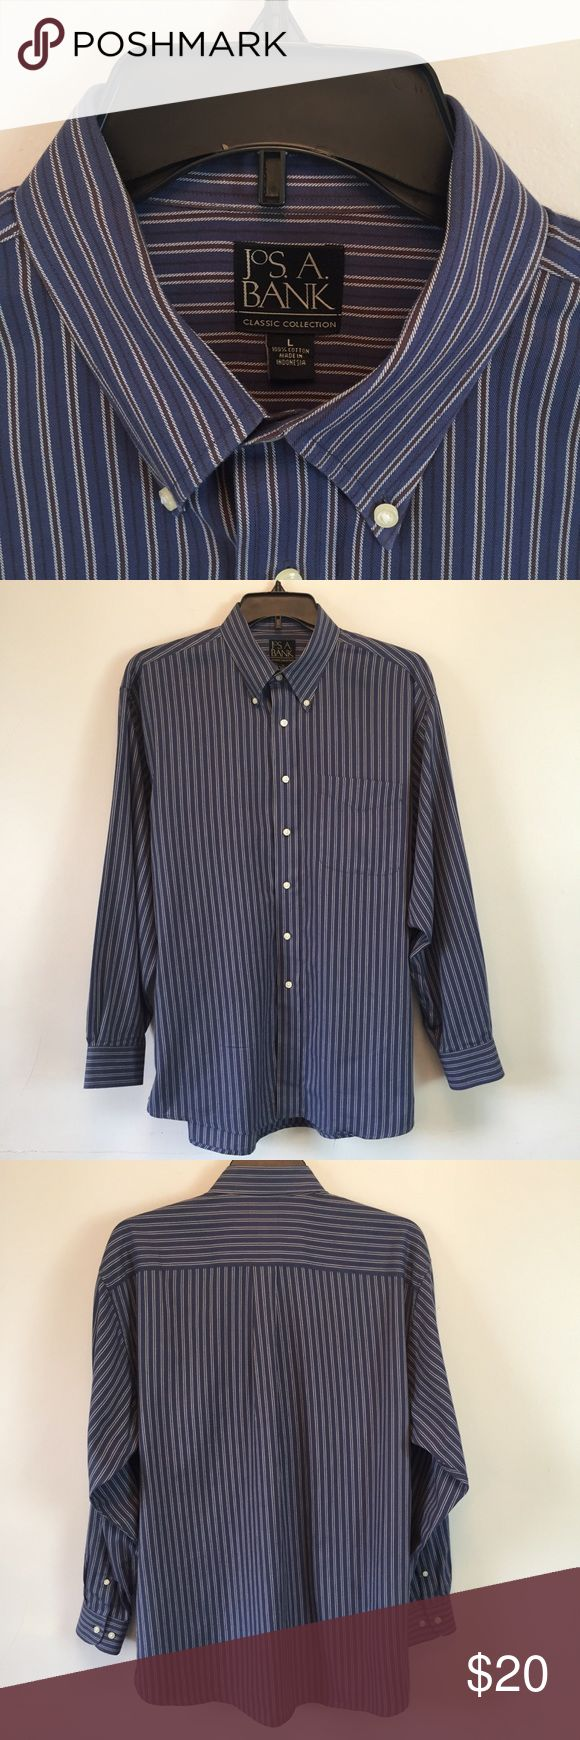 Jos. A. Bank Shirt Mens L Large Blue Striped EUC (With